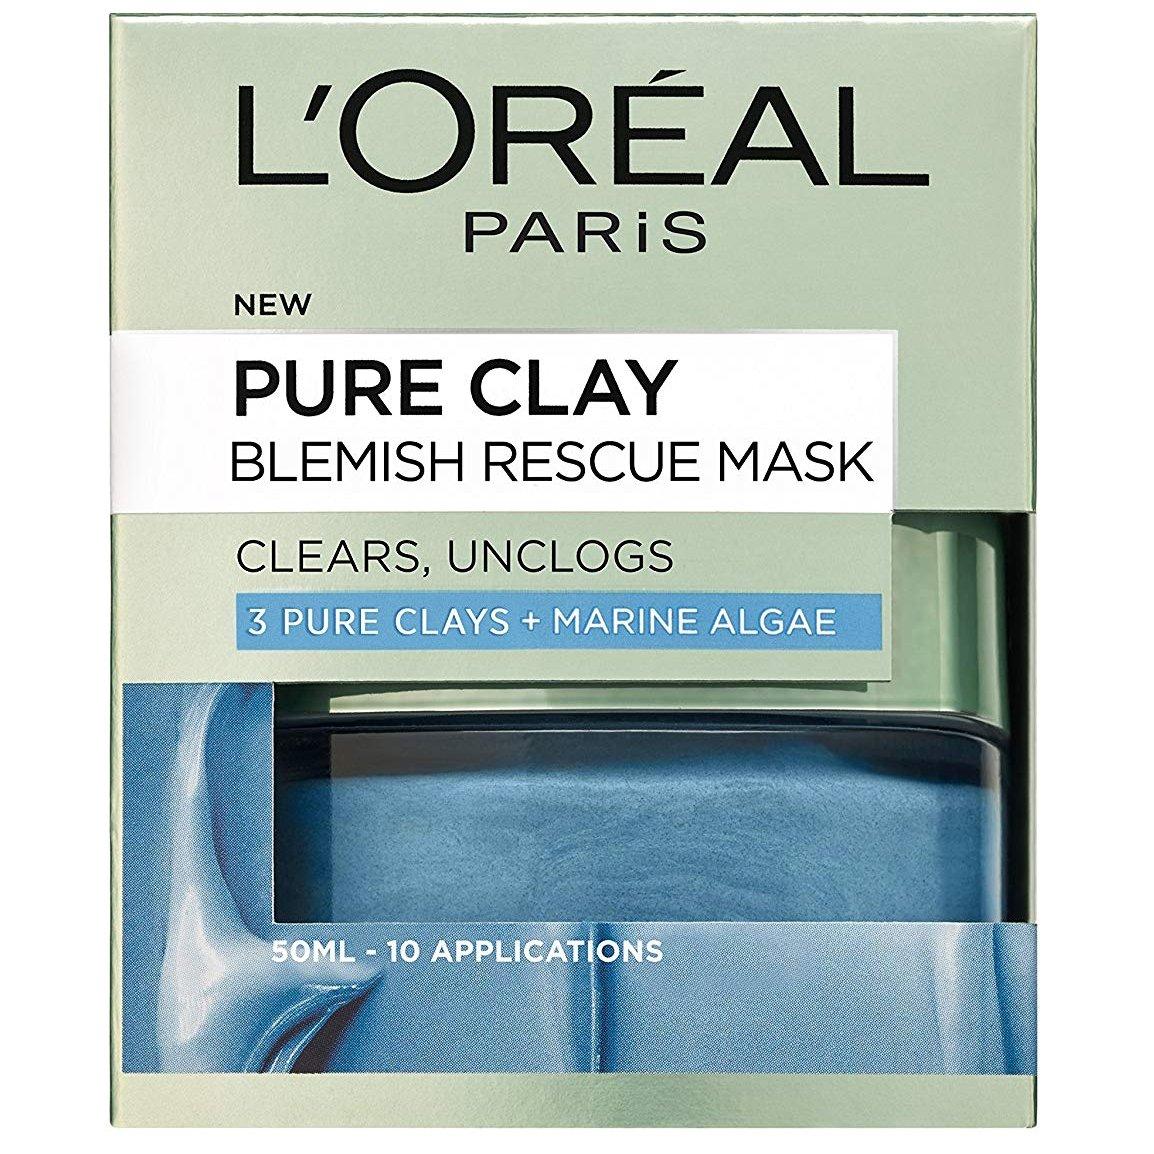 L'oreal Paris Pure Clay Blemish Rescue Mask Μάσκα Αργίλου για Εντατικό Καθαρισμό & Μείωση των Ατελειών 50ml